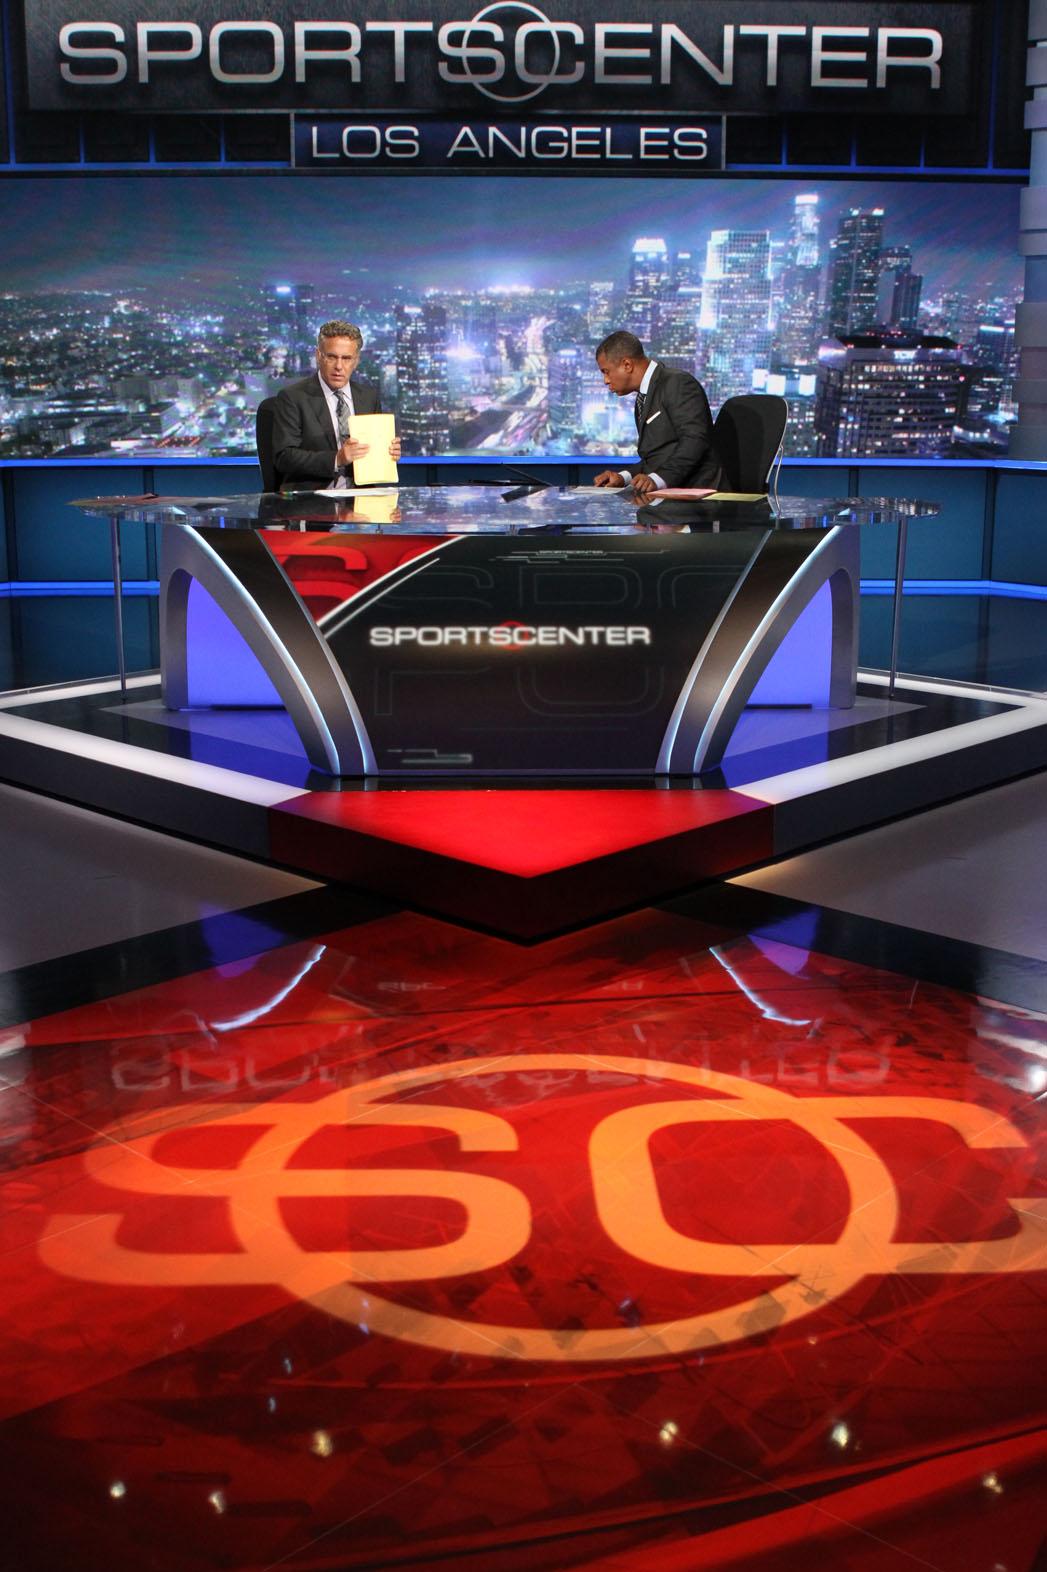 Espn S New Sportscenter Los Angeles Studio Puts Focus On The West Coast Hollywood Reporter